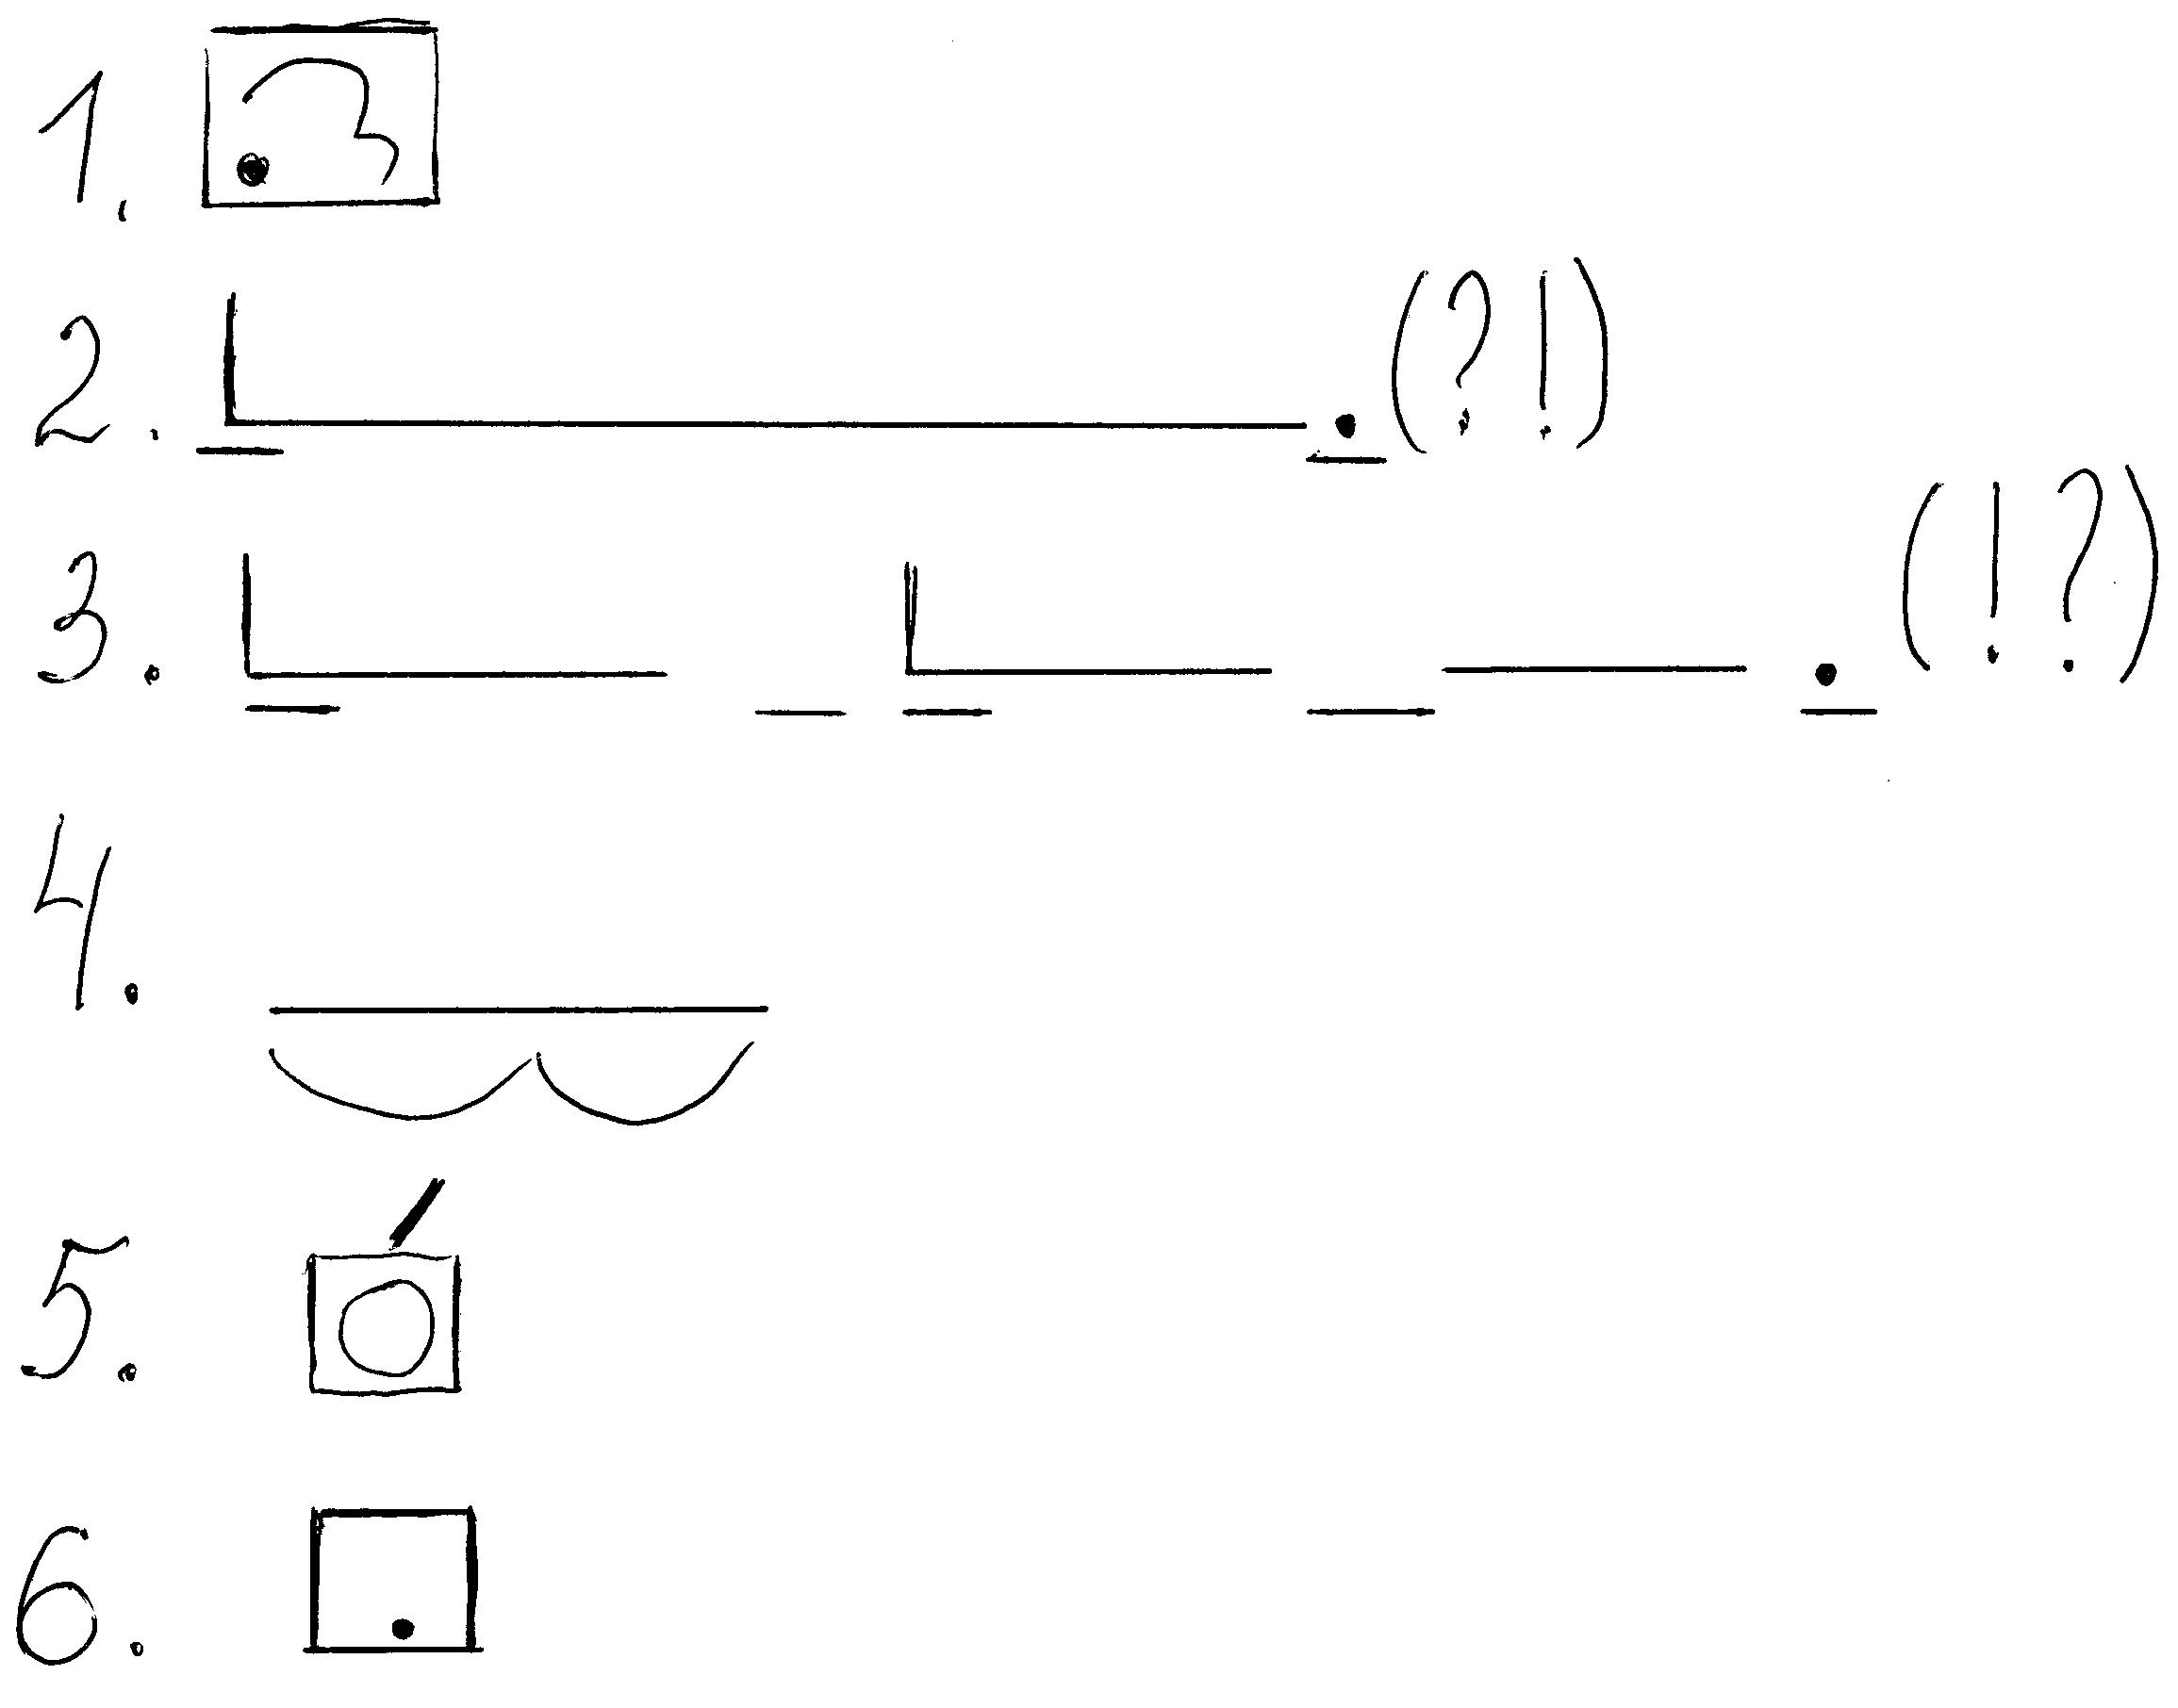 F:\Новая папка\File0554.bmp